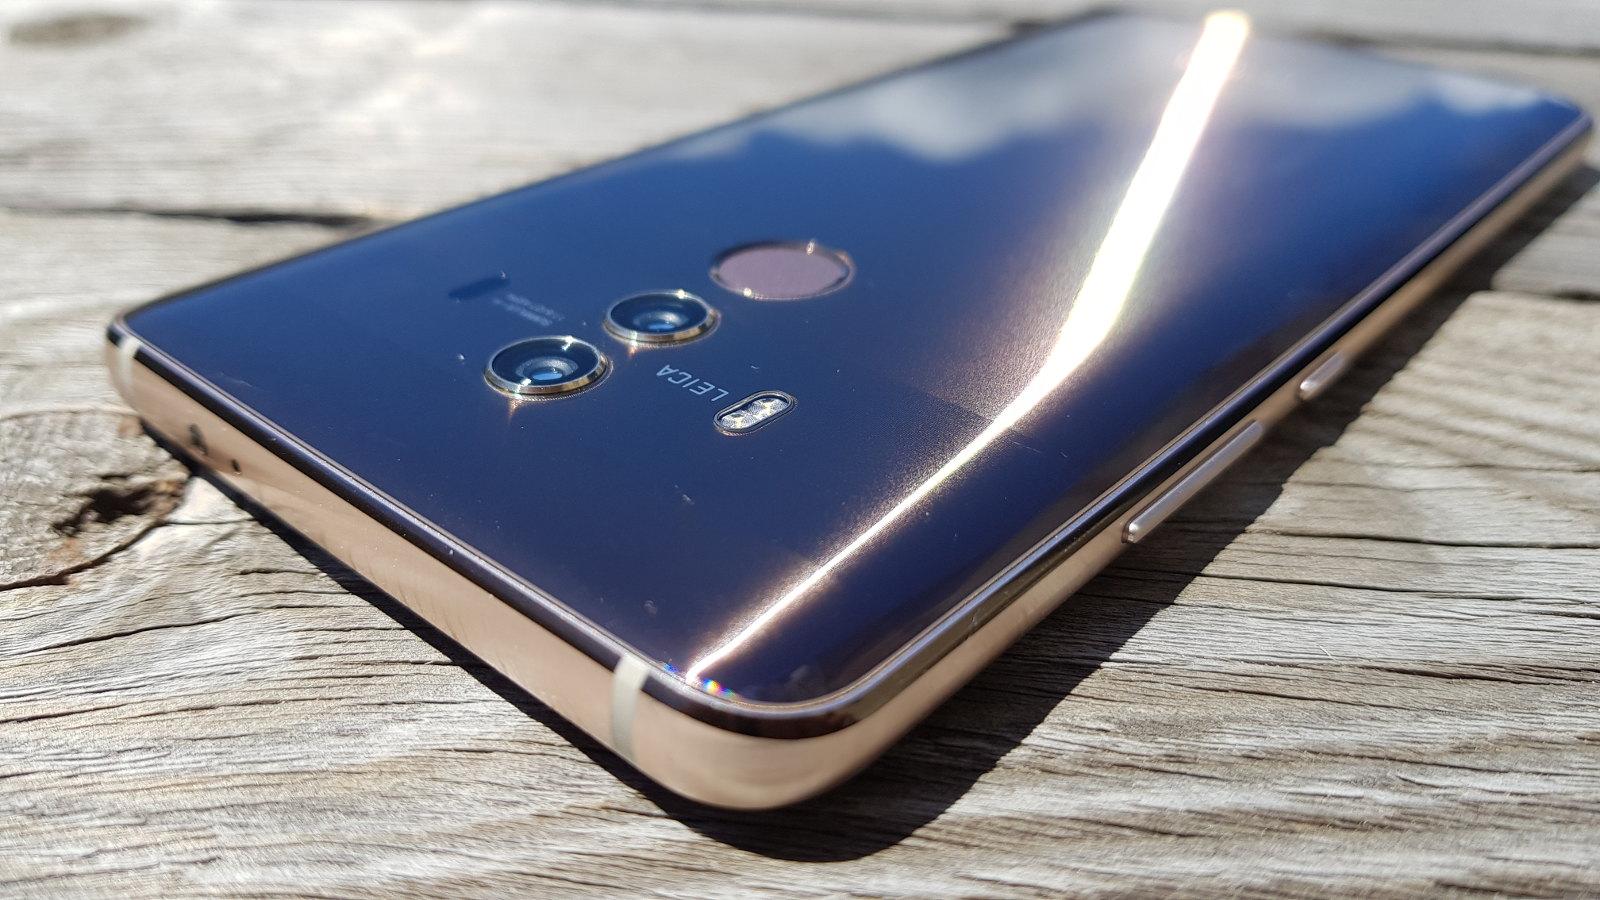 Spec comparison: Huawei Mate 10 Pro vs iPhone X [Sponsored